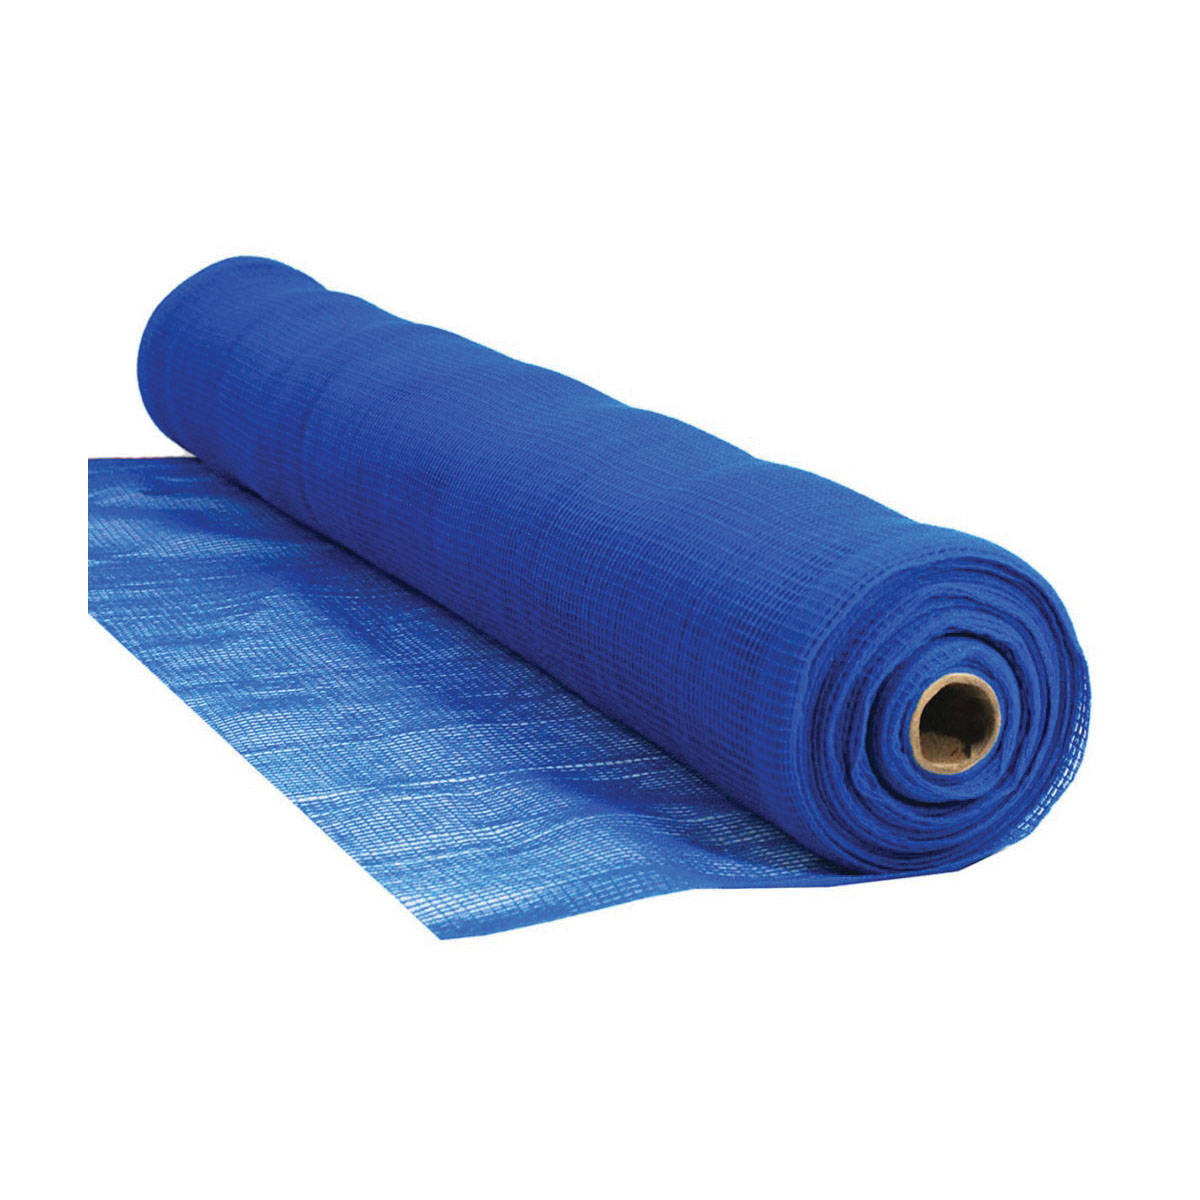 Eagle® SG-02150-BLU-FR Safety Debris Netting - 150 ft L x 2 ft W - 1/4 in Mesh - Polyethylene - Blue